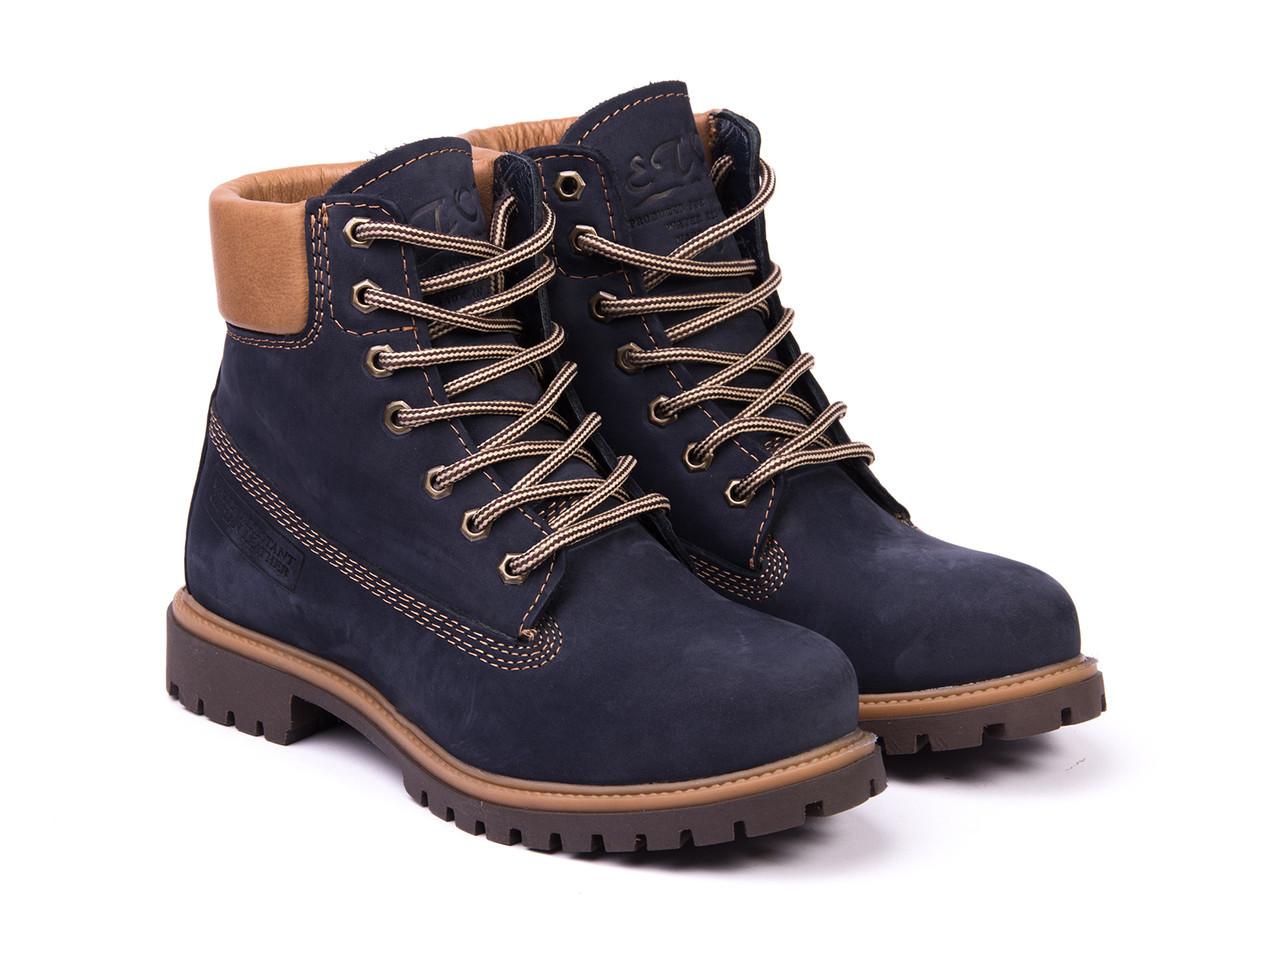 Ботинки Etor 9916-2298 42 синие